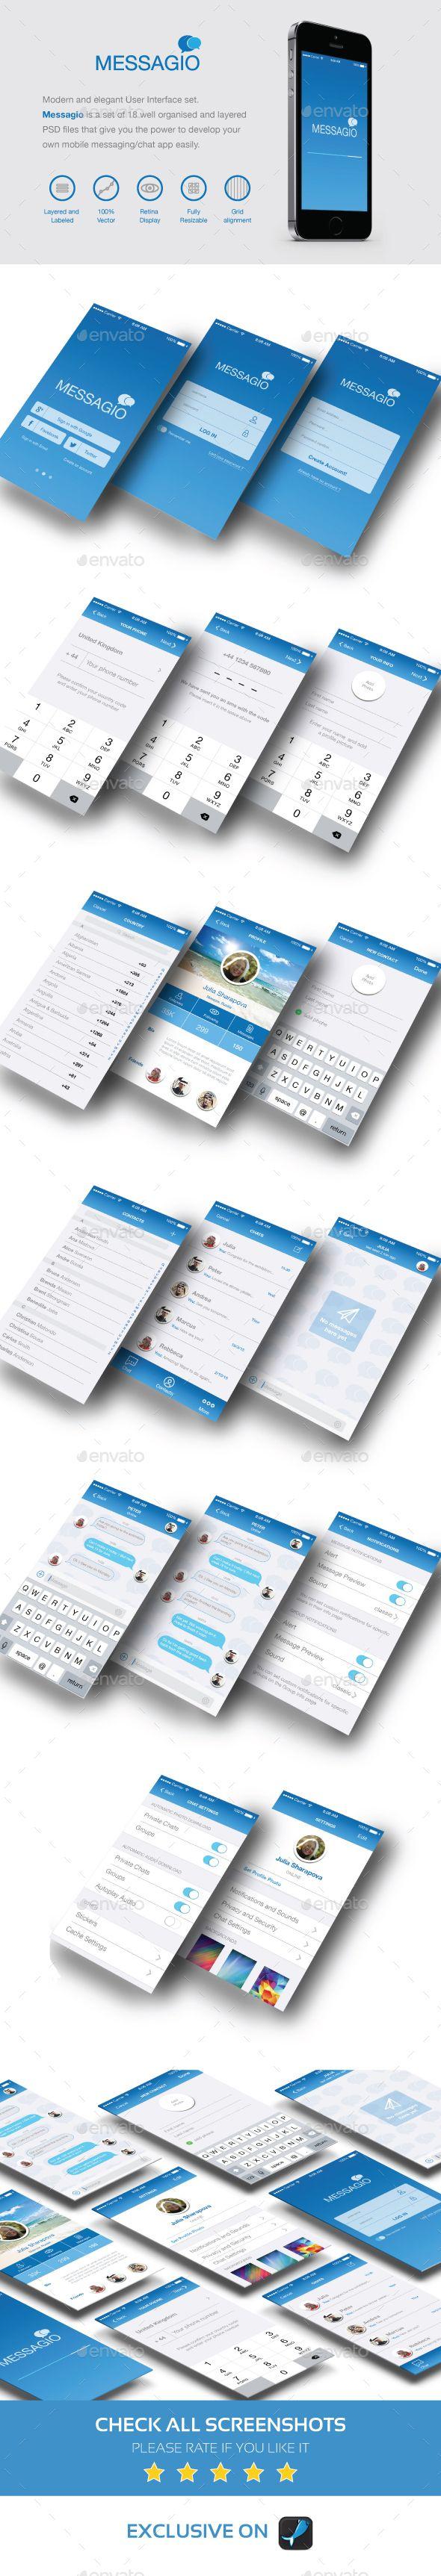 Messagio - Mobile User Interface Set Template PSD #design #ui Download: http://graphicriver.net/item/messagio-mobile-user-interface-set/13336990?ref=ksioks